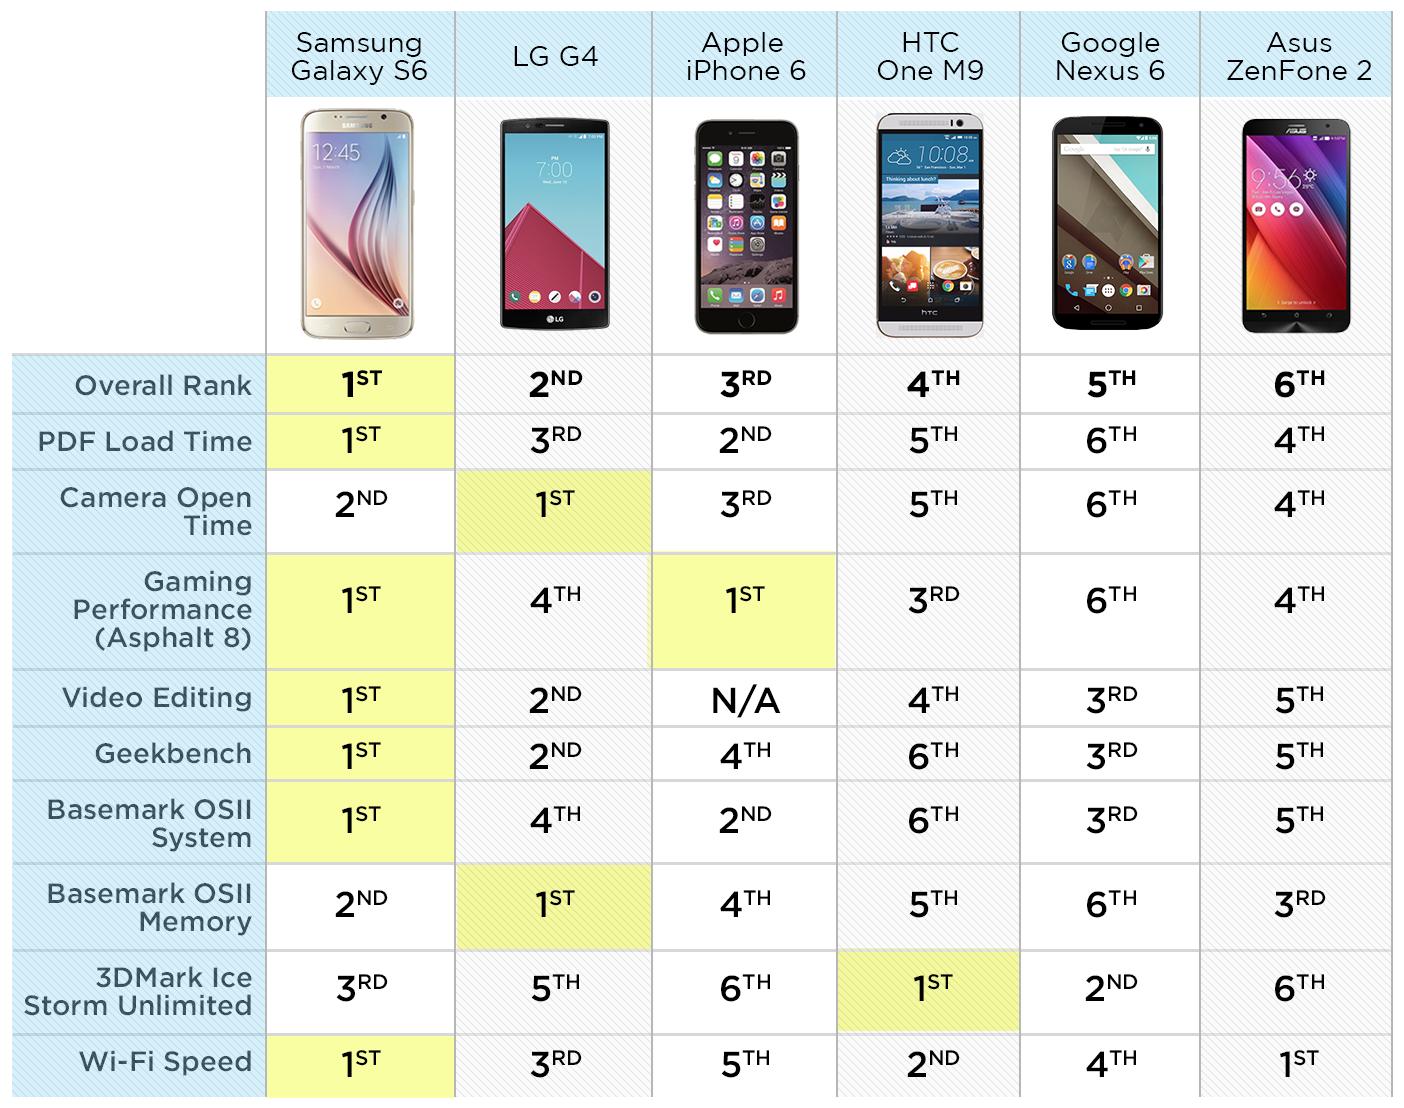 galaxy-s6-vs-zenfone-2-vs-g4-vs-iphone-6-vs-nexus-6-vs-one-m9-speed-tests-8